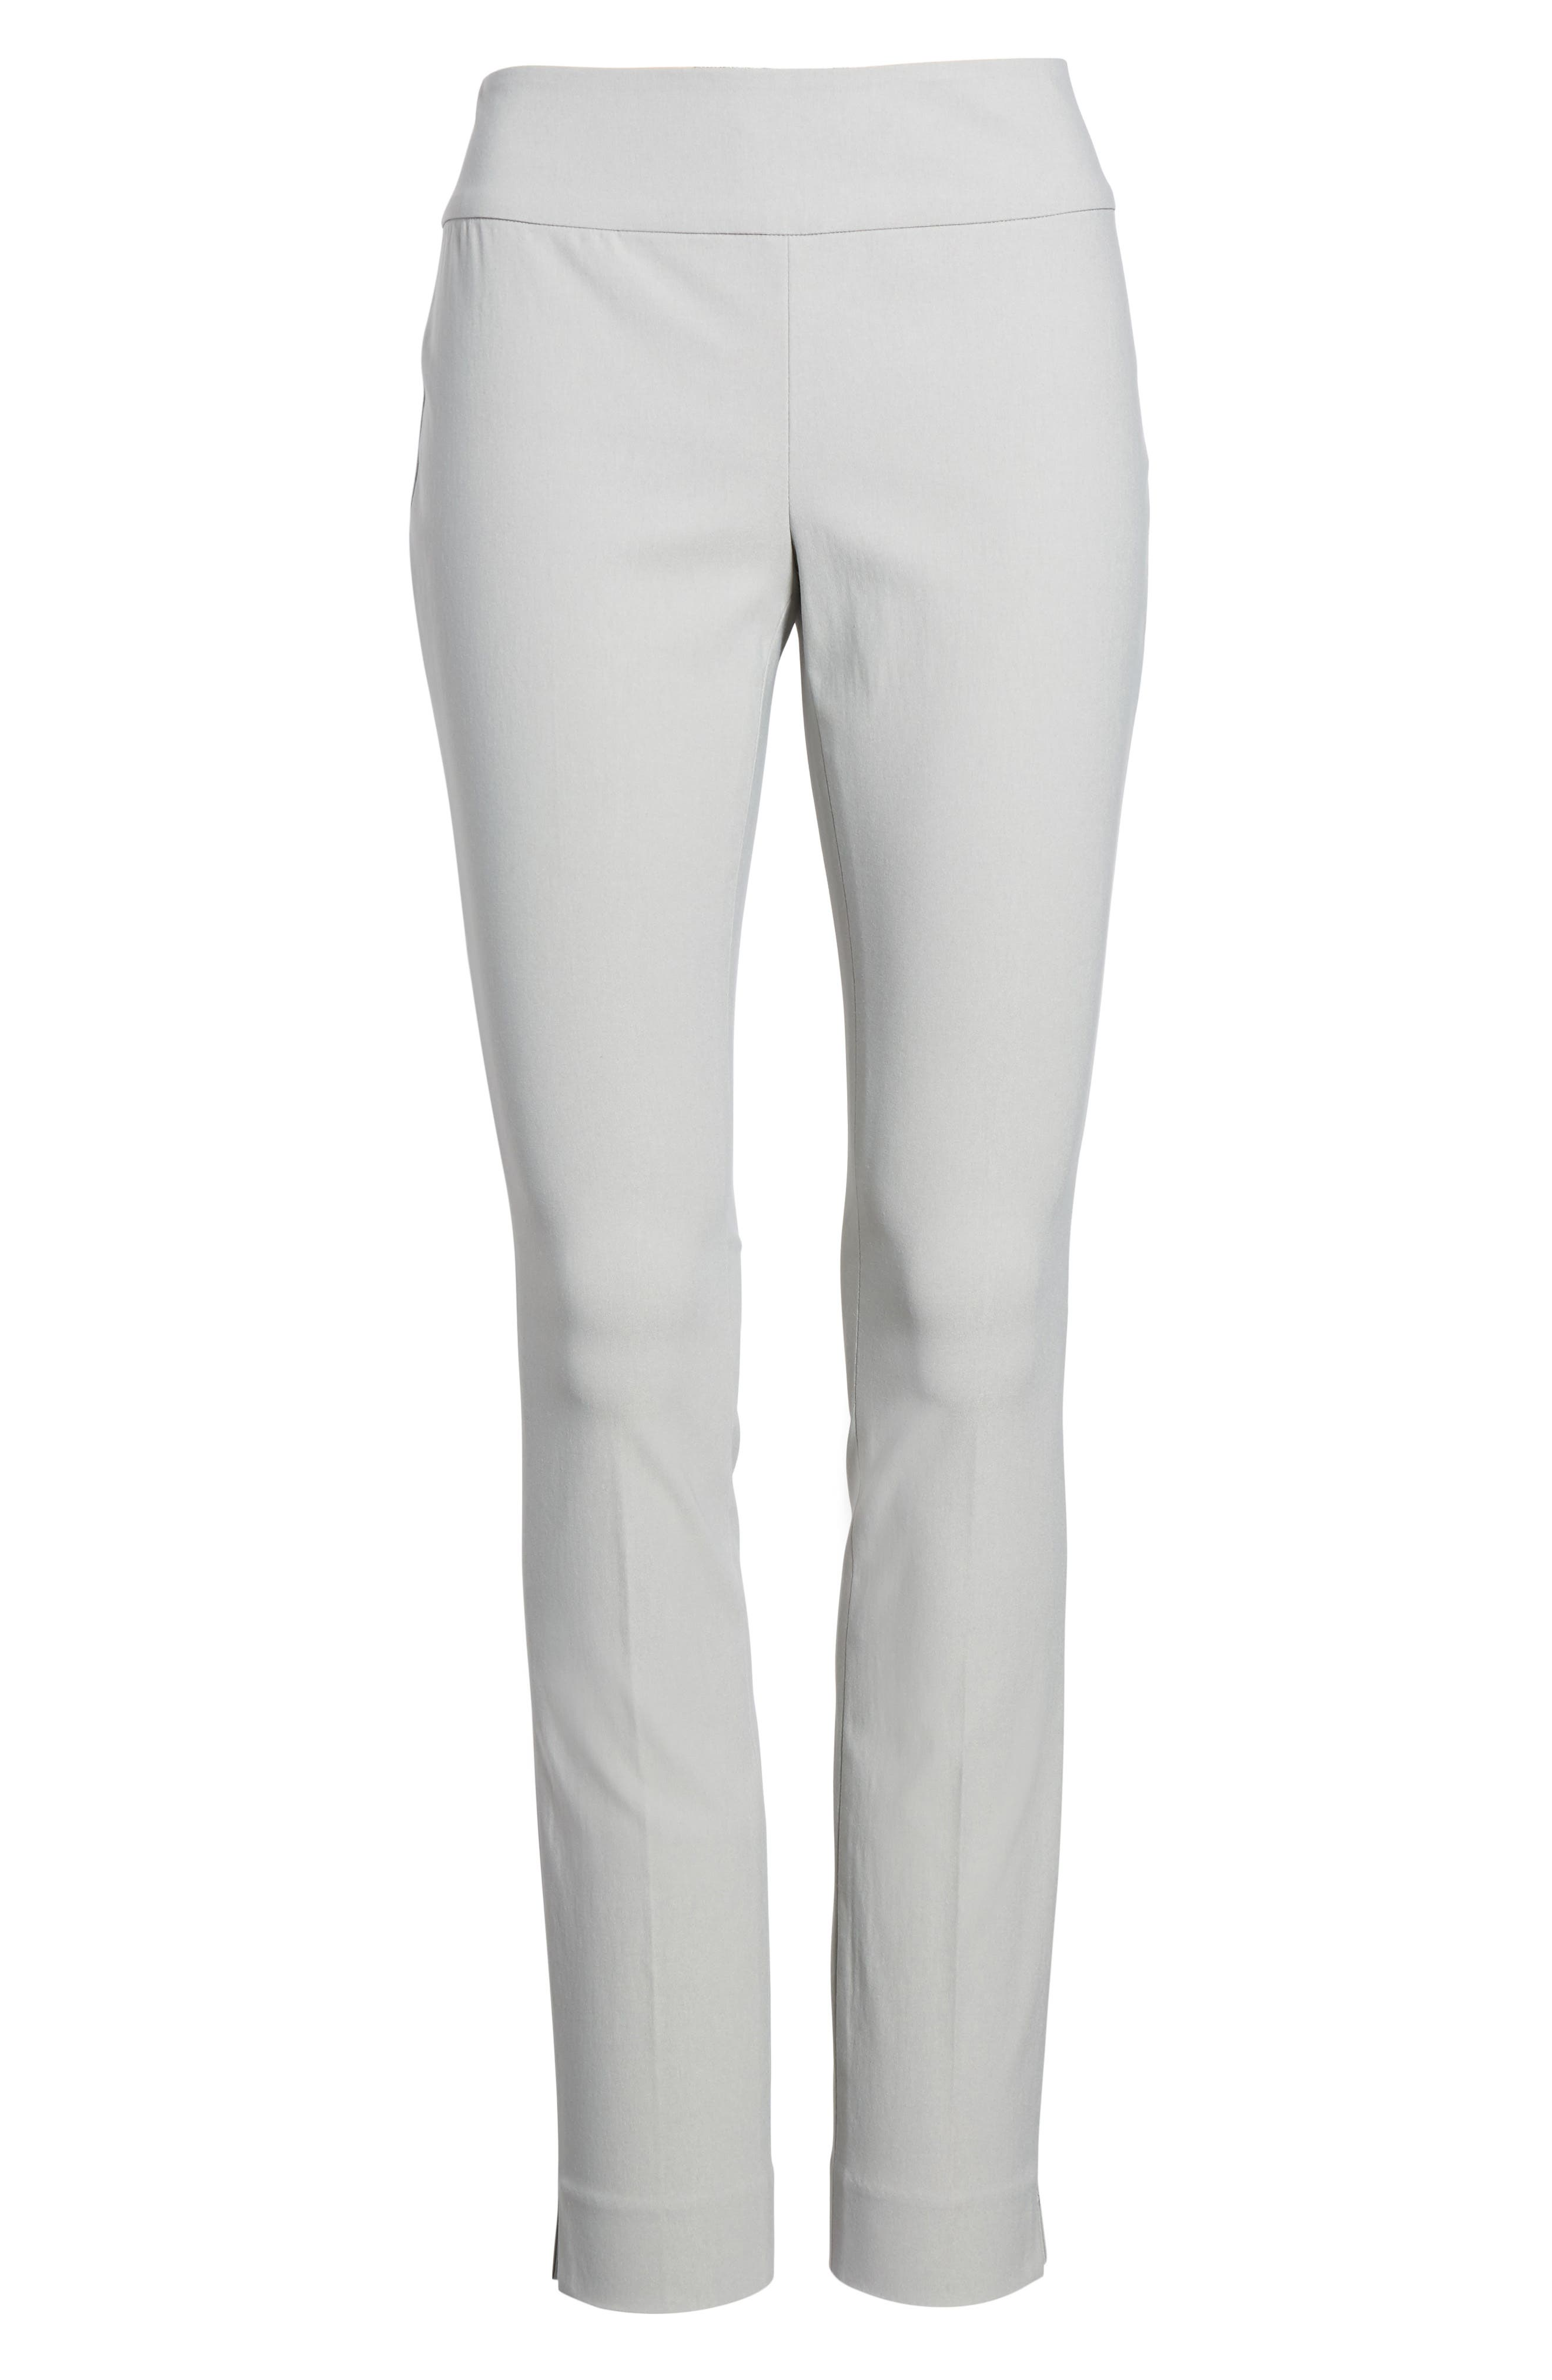 NIC + ZOE Wonderstretch Slim Pants,                             Alternate thumbnail 7, color,                             050